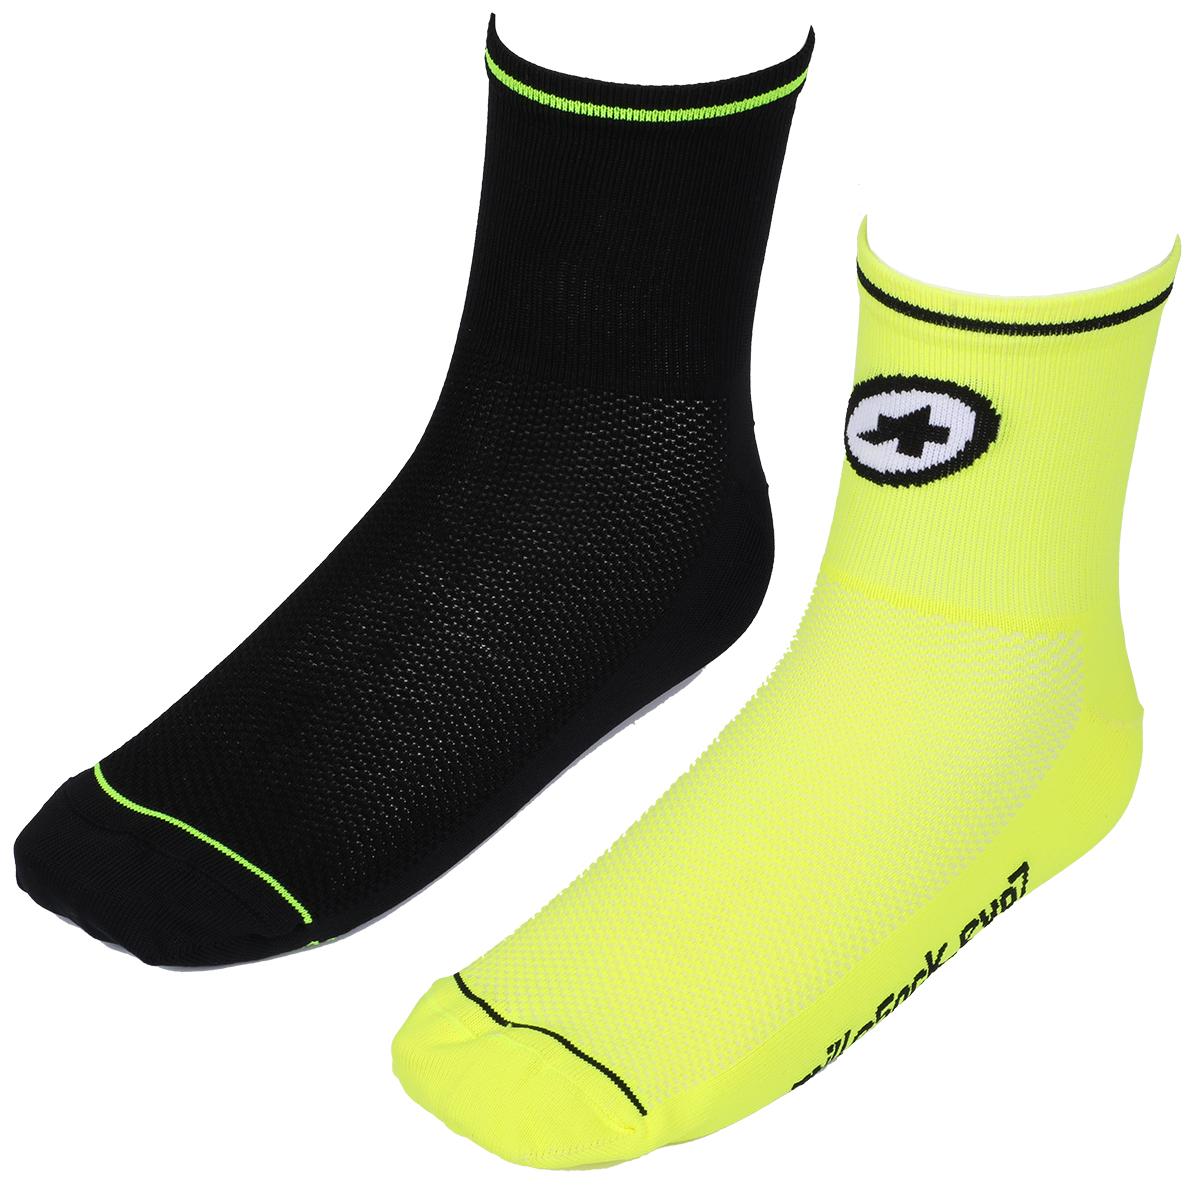 Assos Mille Evo 7 Socks - 2 Pairs